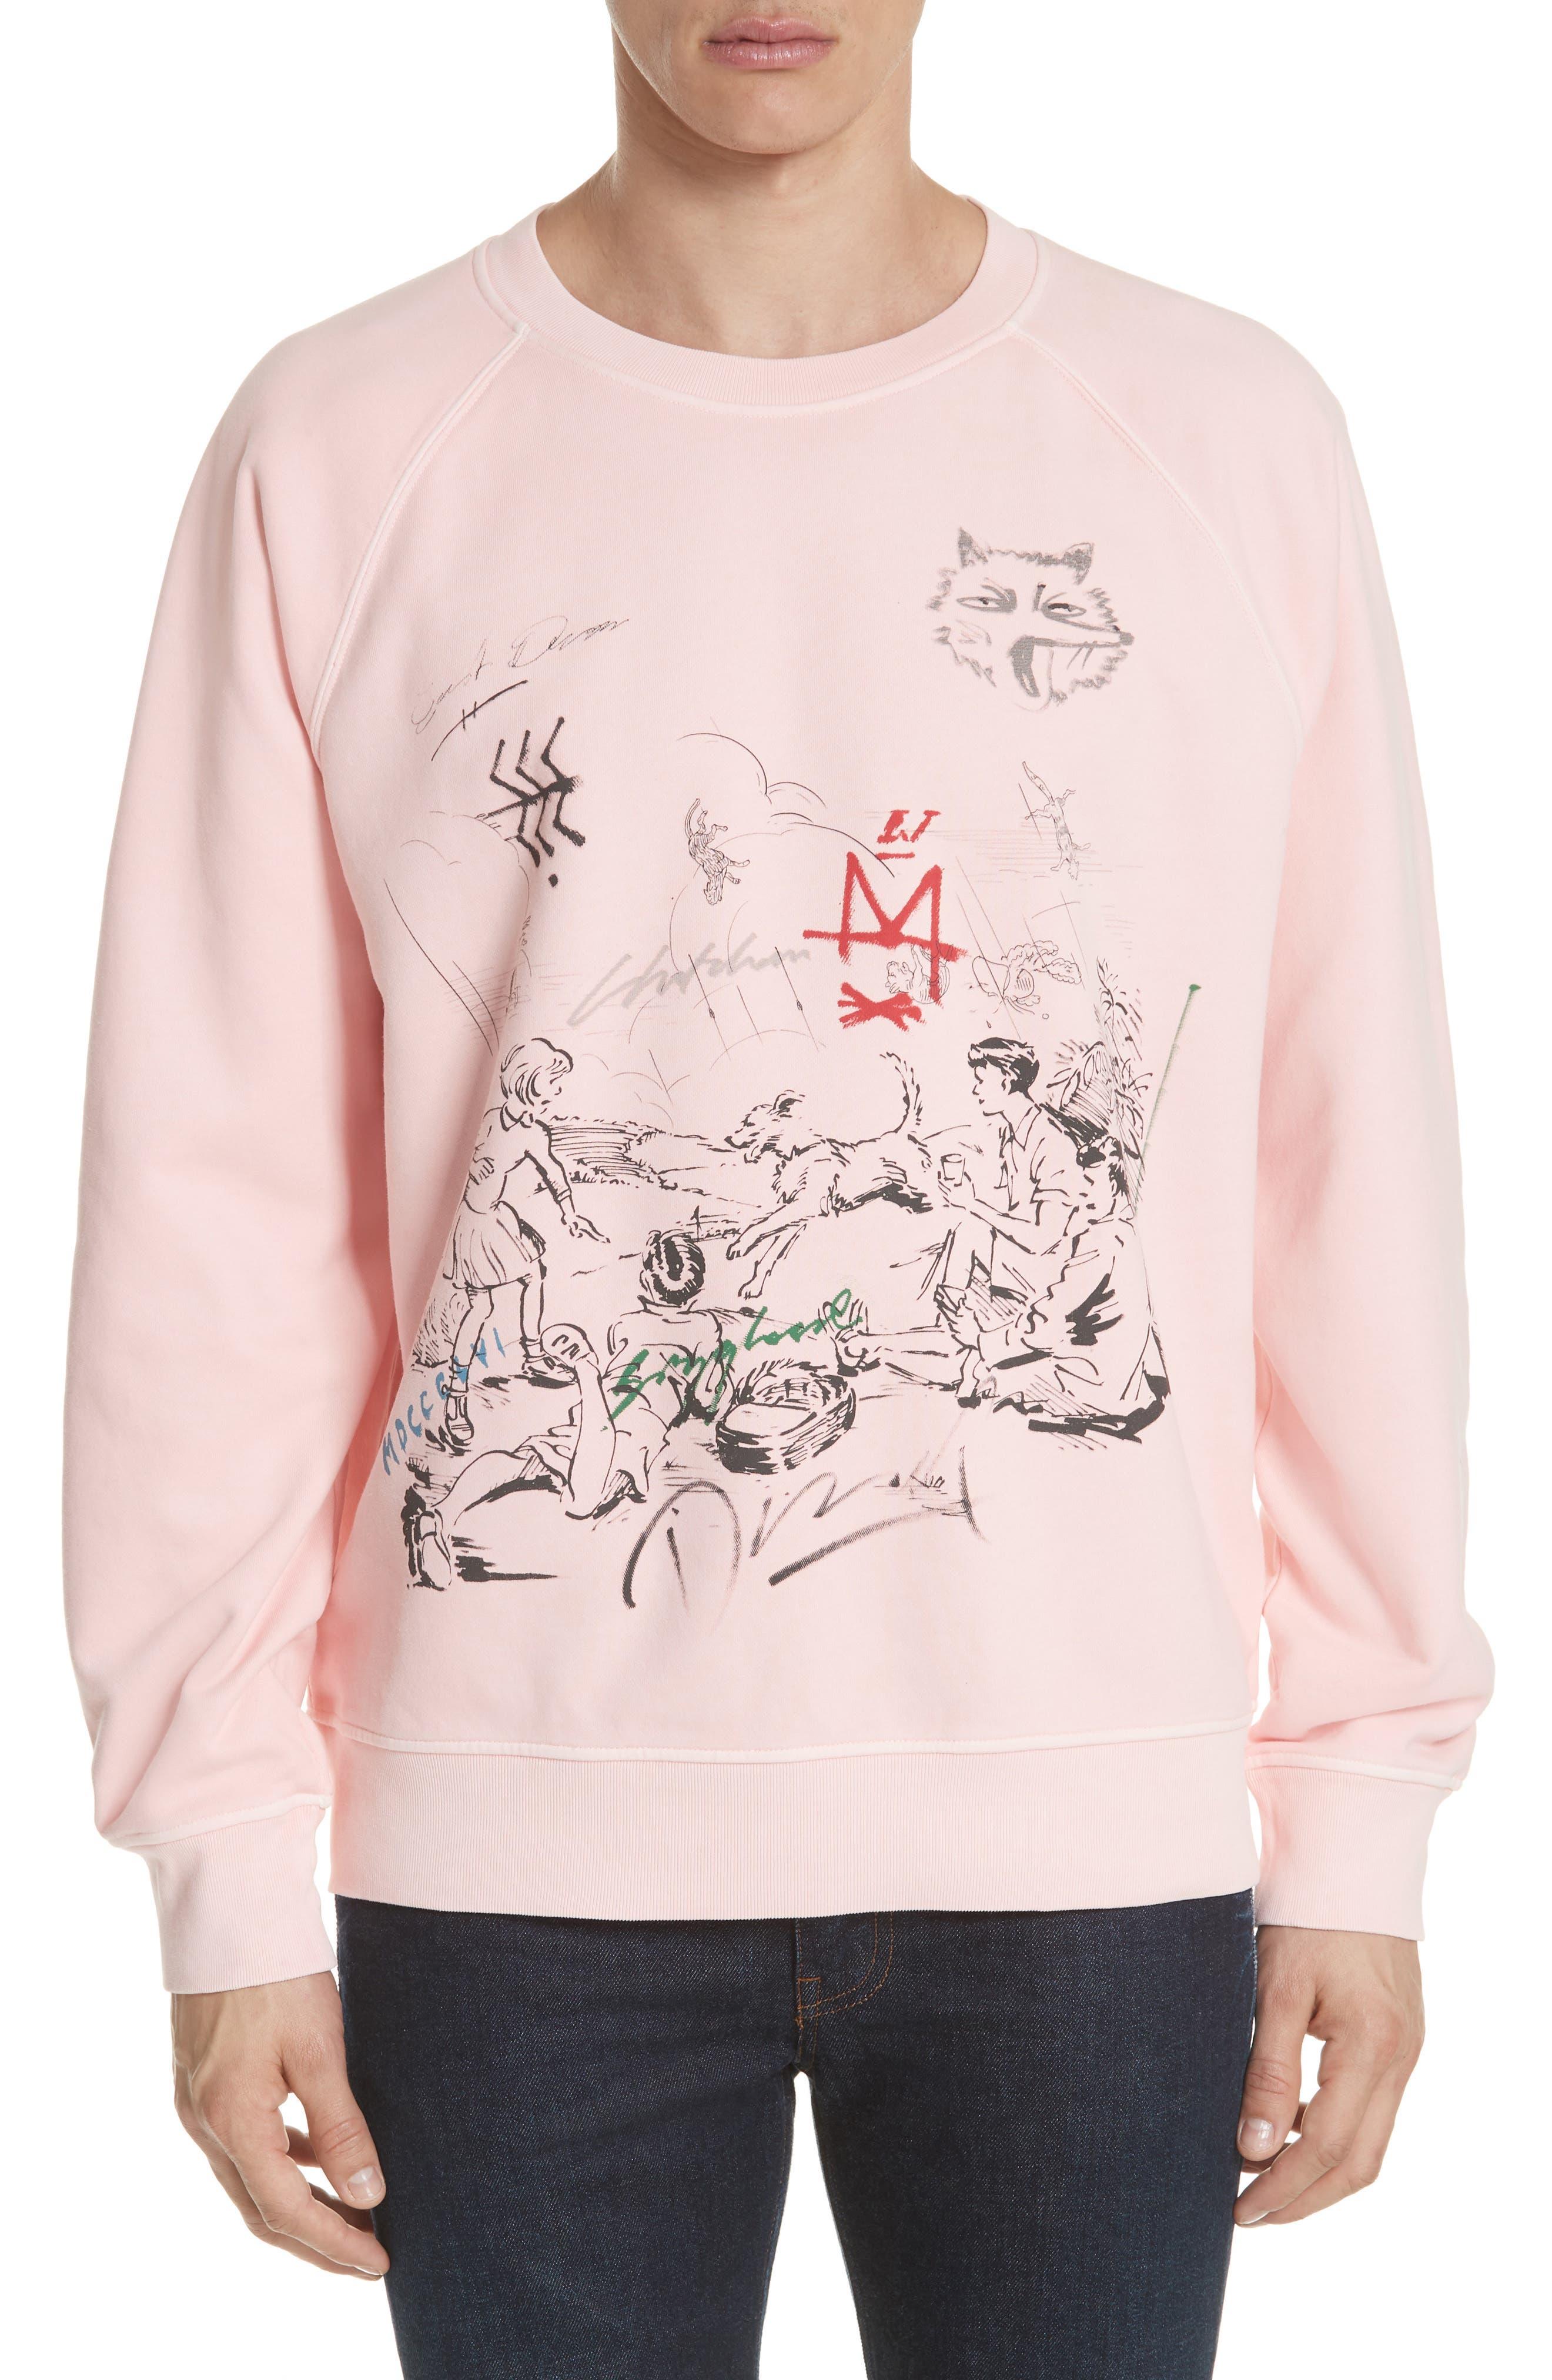 Fellworth Graphic Crewneck Sweatshirt,                         Main,                         color, Light Pink